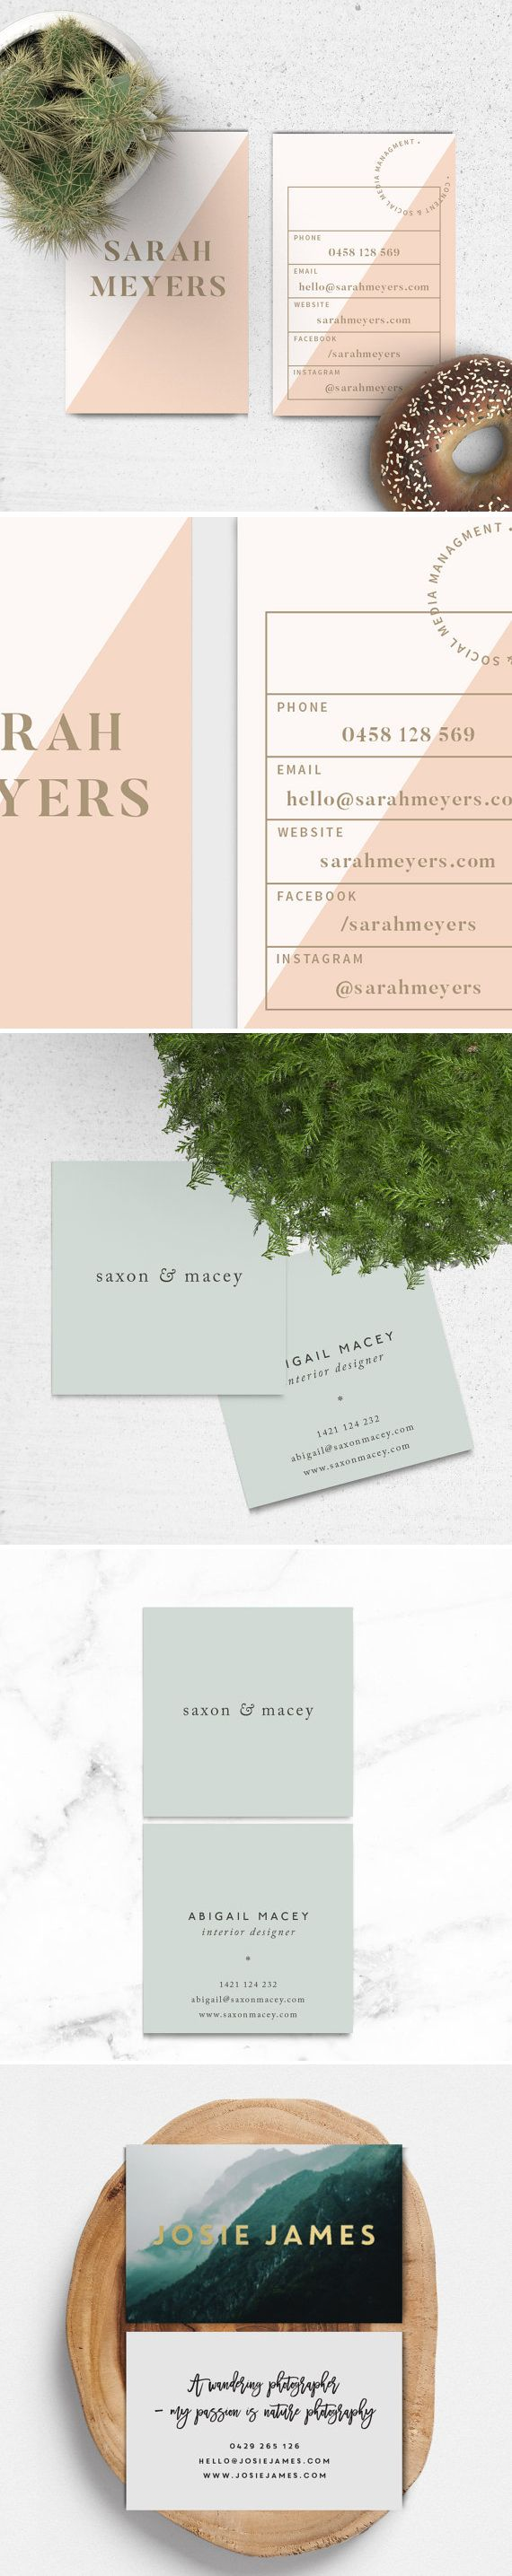 "Premade Business Card Design // Blush, Gold, Modern, Elegant, Colorblock, Business Branding, Modern, Geometric, Triangles, Bold - ""Sarah"" // StoriesDesignStudio #graphicdesign #branding"